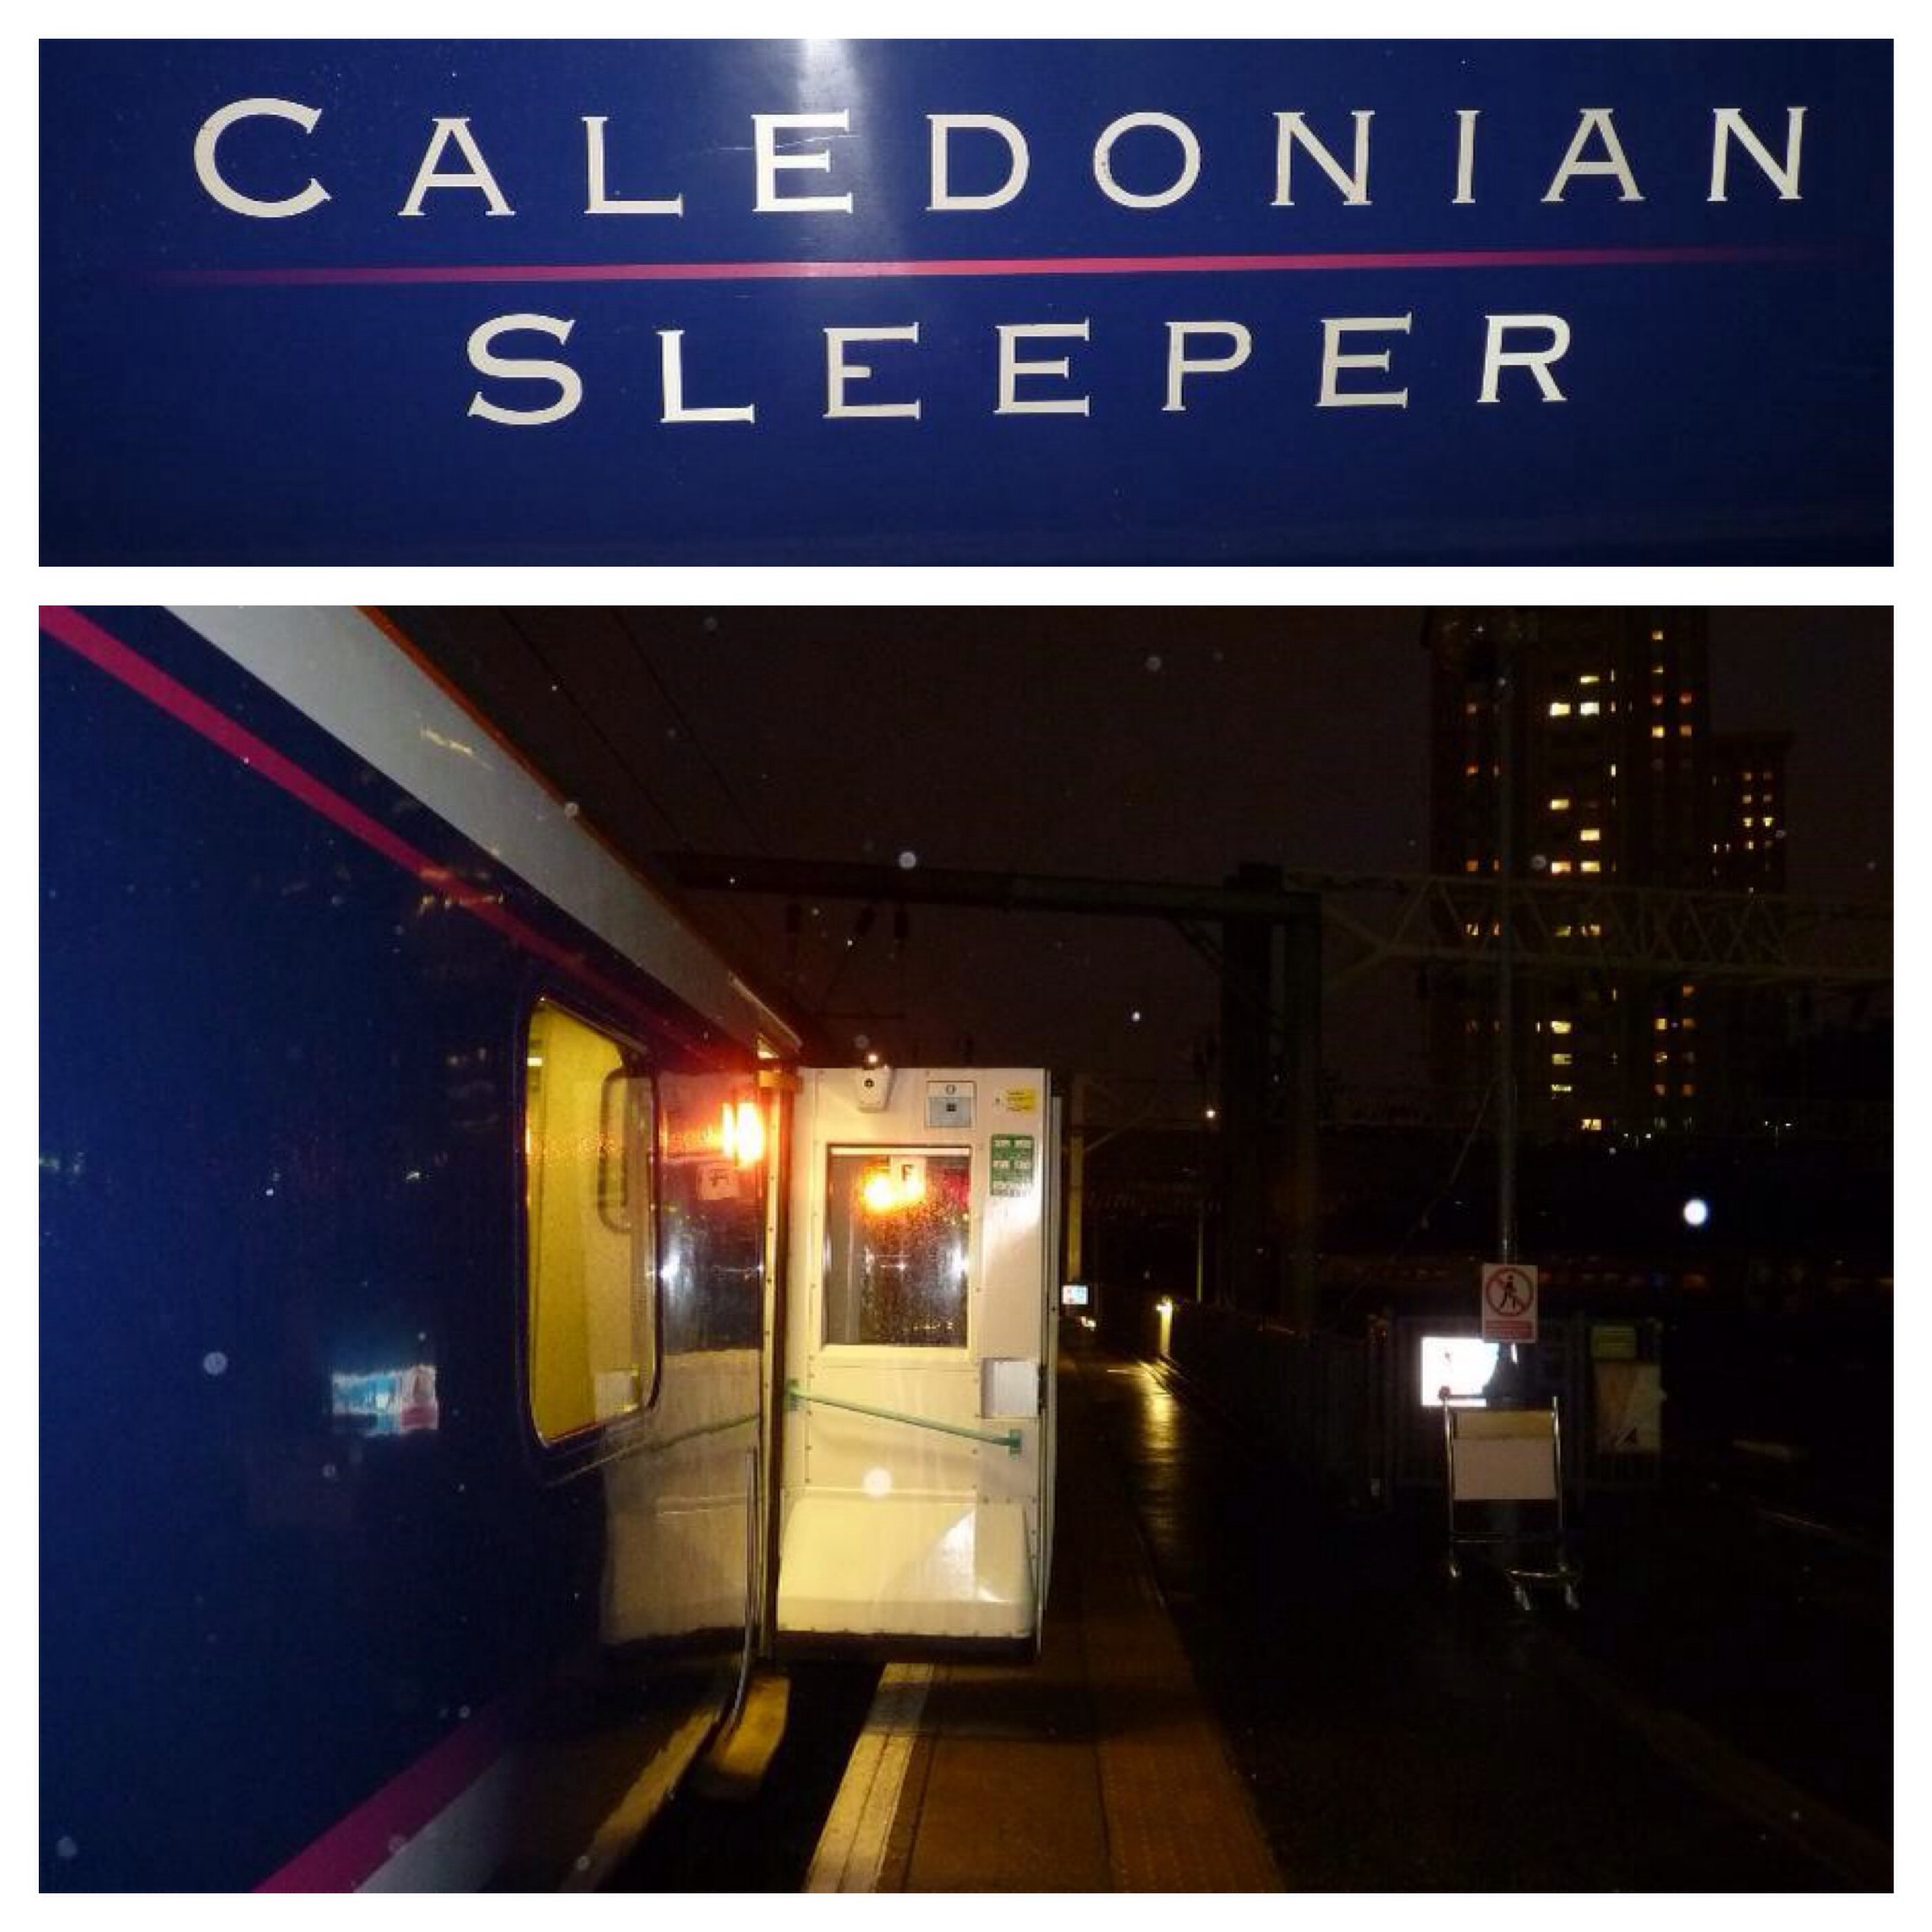 Boarding the Caledonian Sleeper at London Euston